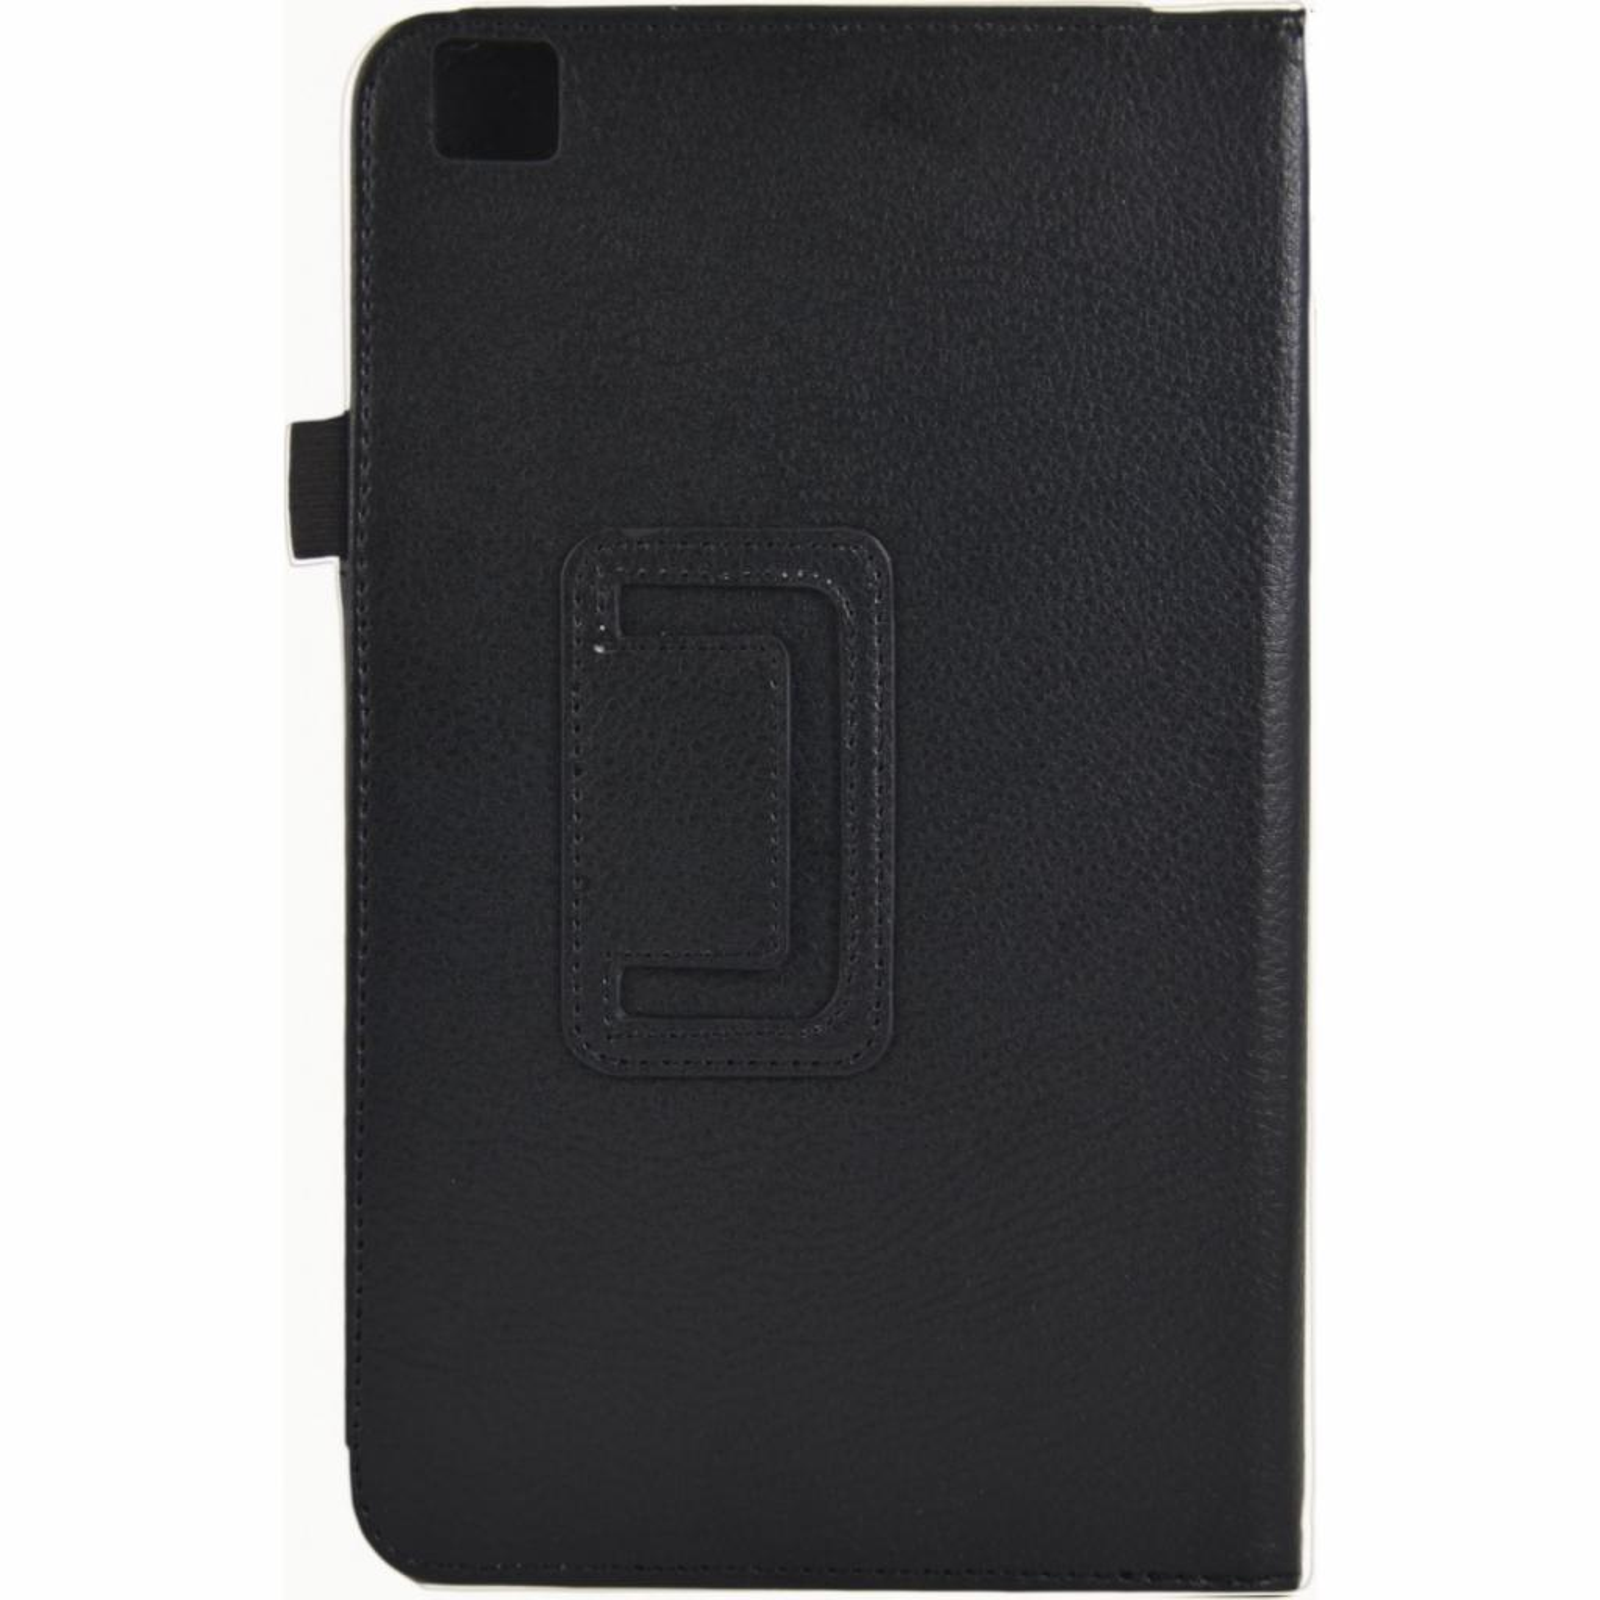 "Чехол для планшета Pro-case 8"" Pro-case Galaxy Tab 3 T3100 8"" (Tab 3 T3100) изображение 2"